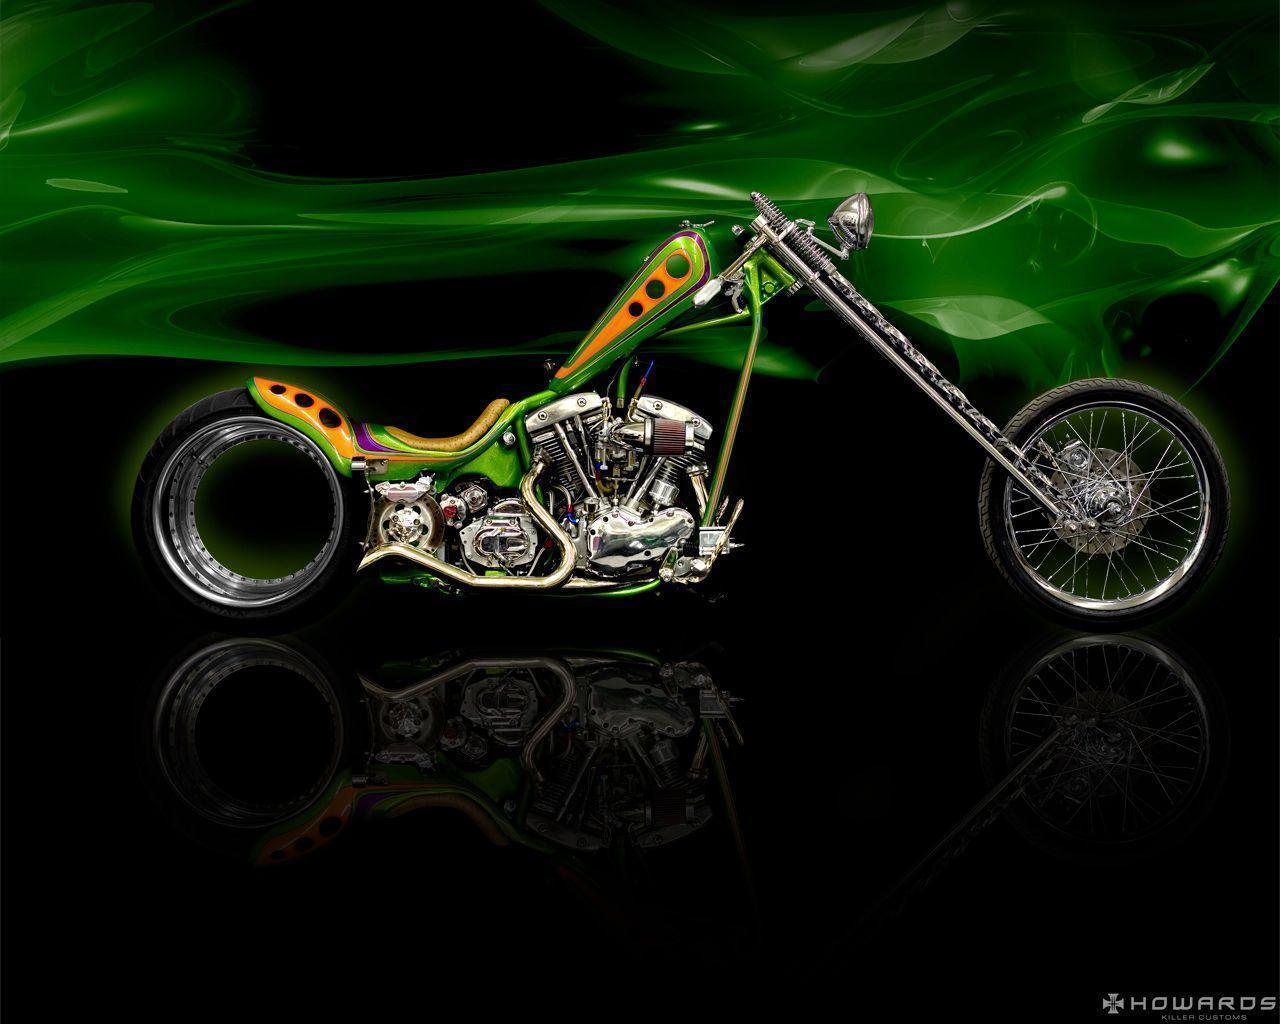 17 Best ideas about Harley Davidson Wallpaper on Pinterest ...